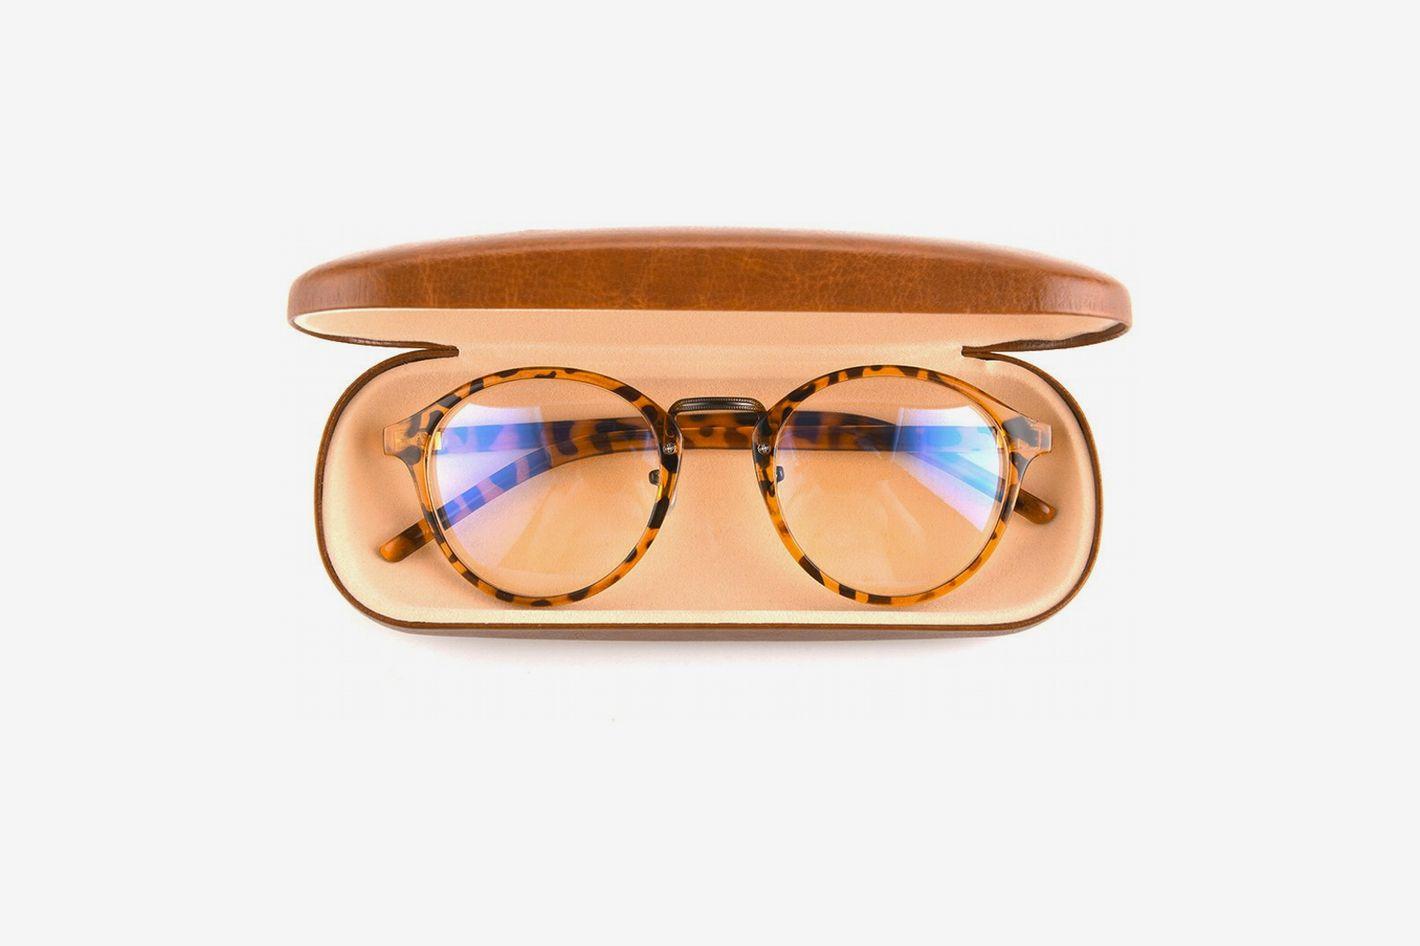 Gudzws Anti Blue Light Glasses Retro Round Unisex